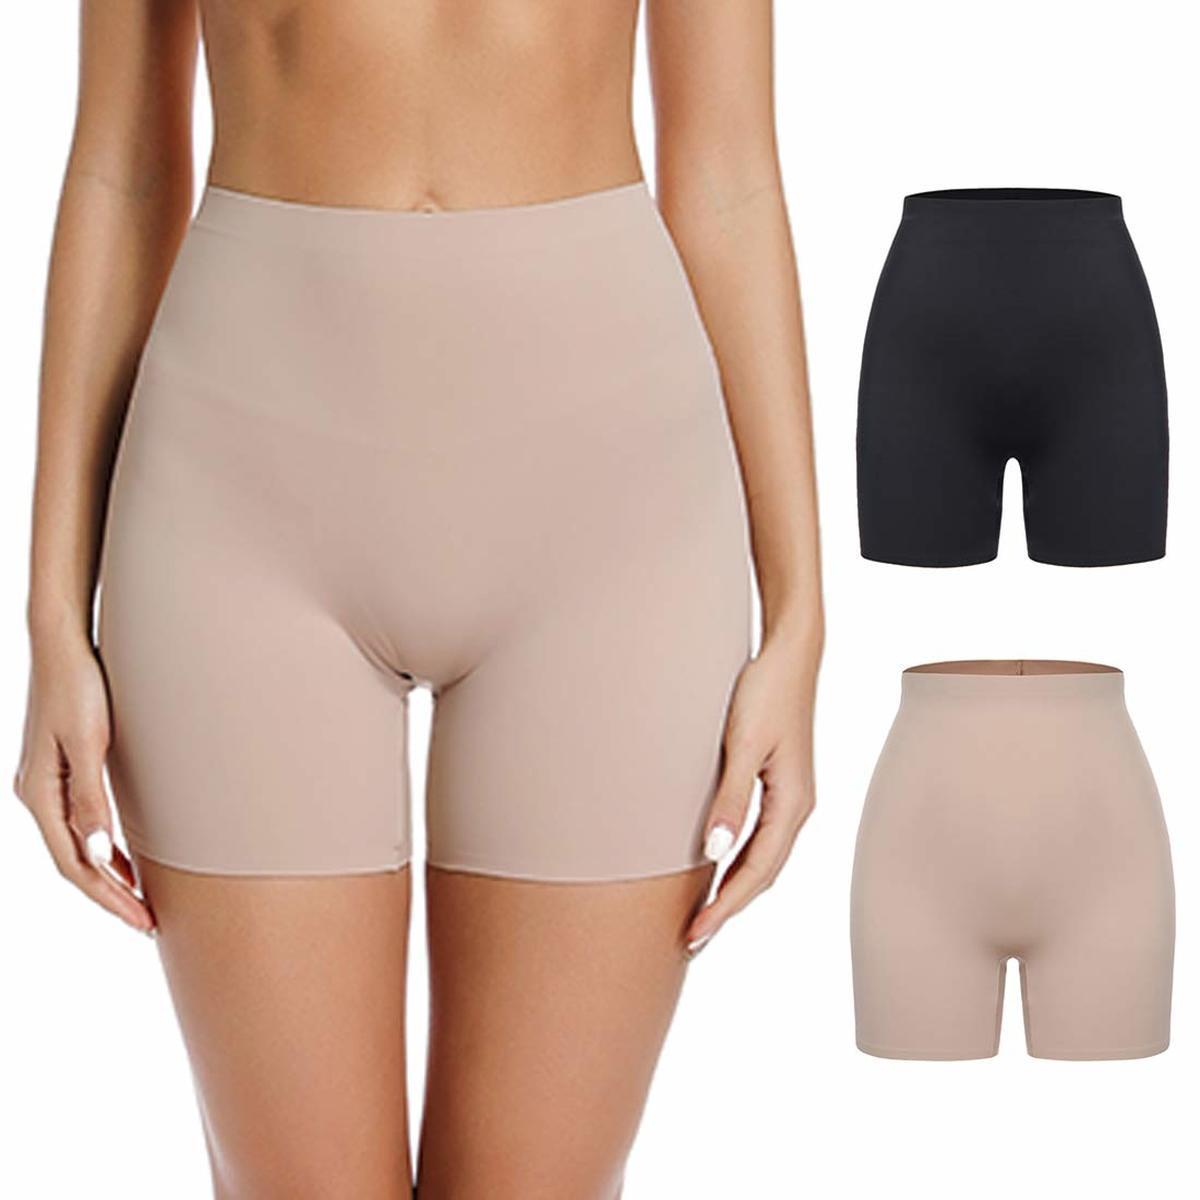 Seamless Slimming Underwear Panties Boyshort For Women Safety Shorts Pants Soft Invisible Underwear Briefs High Waist Panties